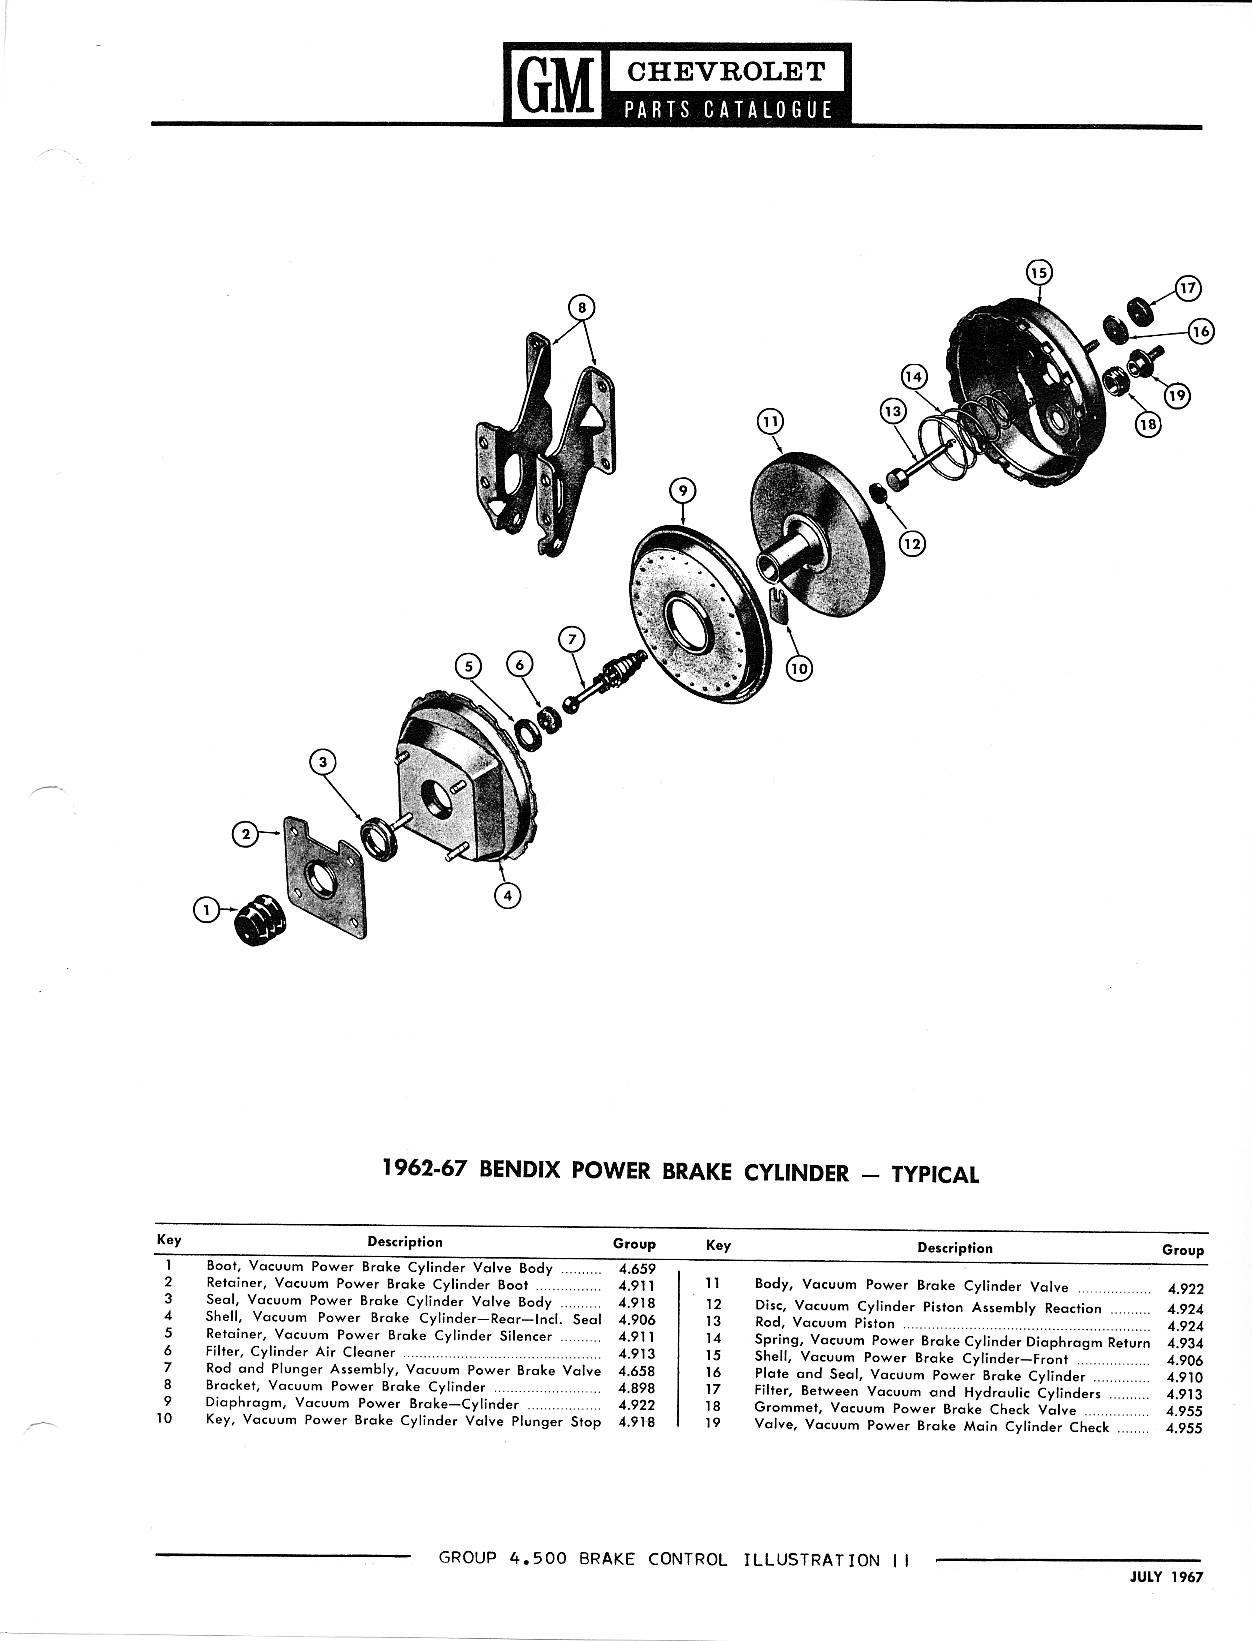 1958-1968 Chevrolet Parts Catalog / Image11.jpg